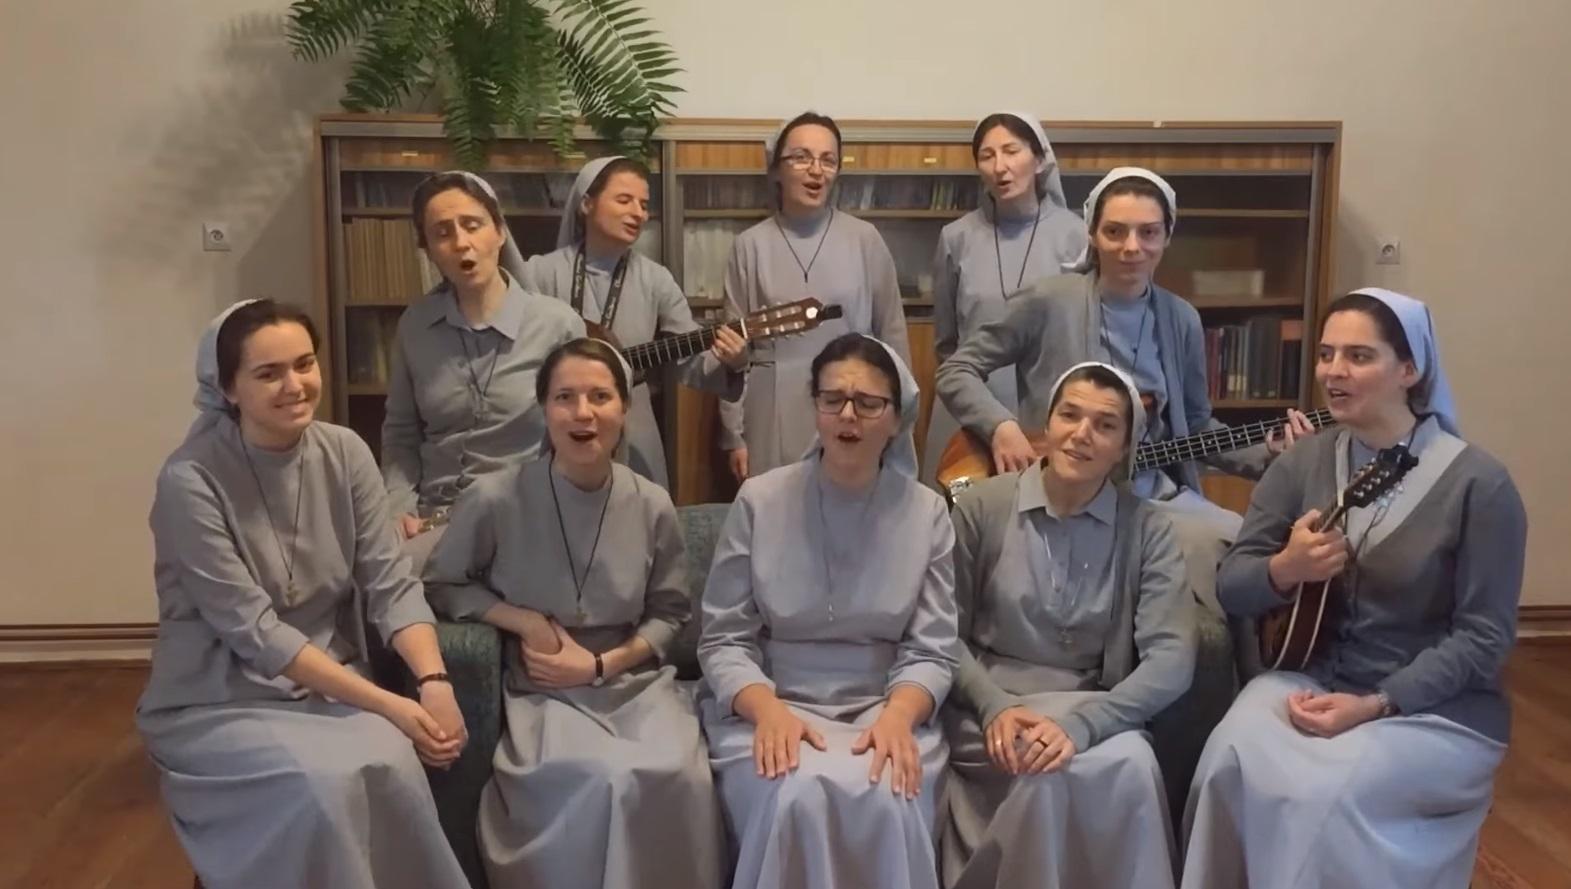 De poolse missiezusters van Maria